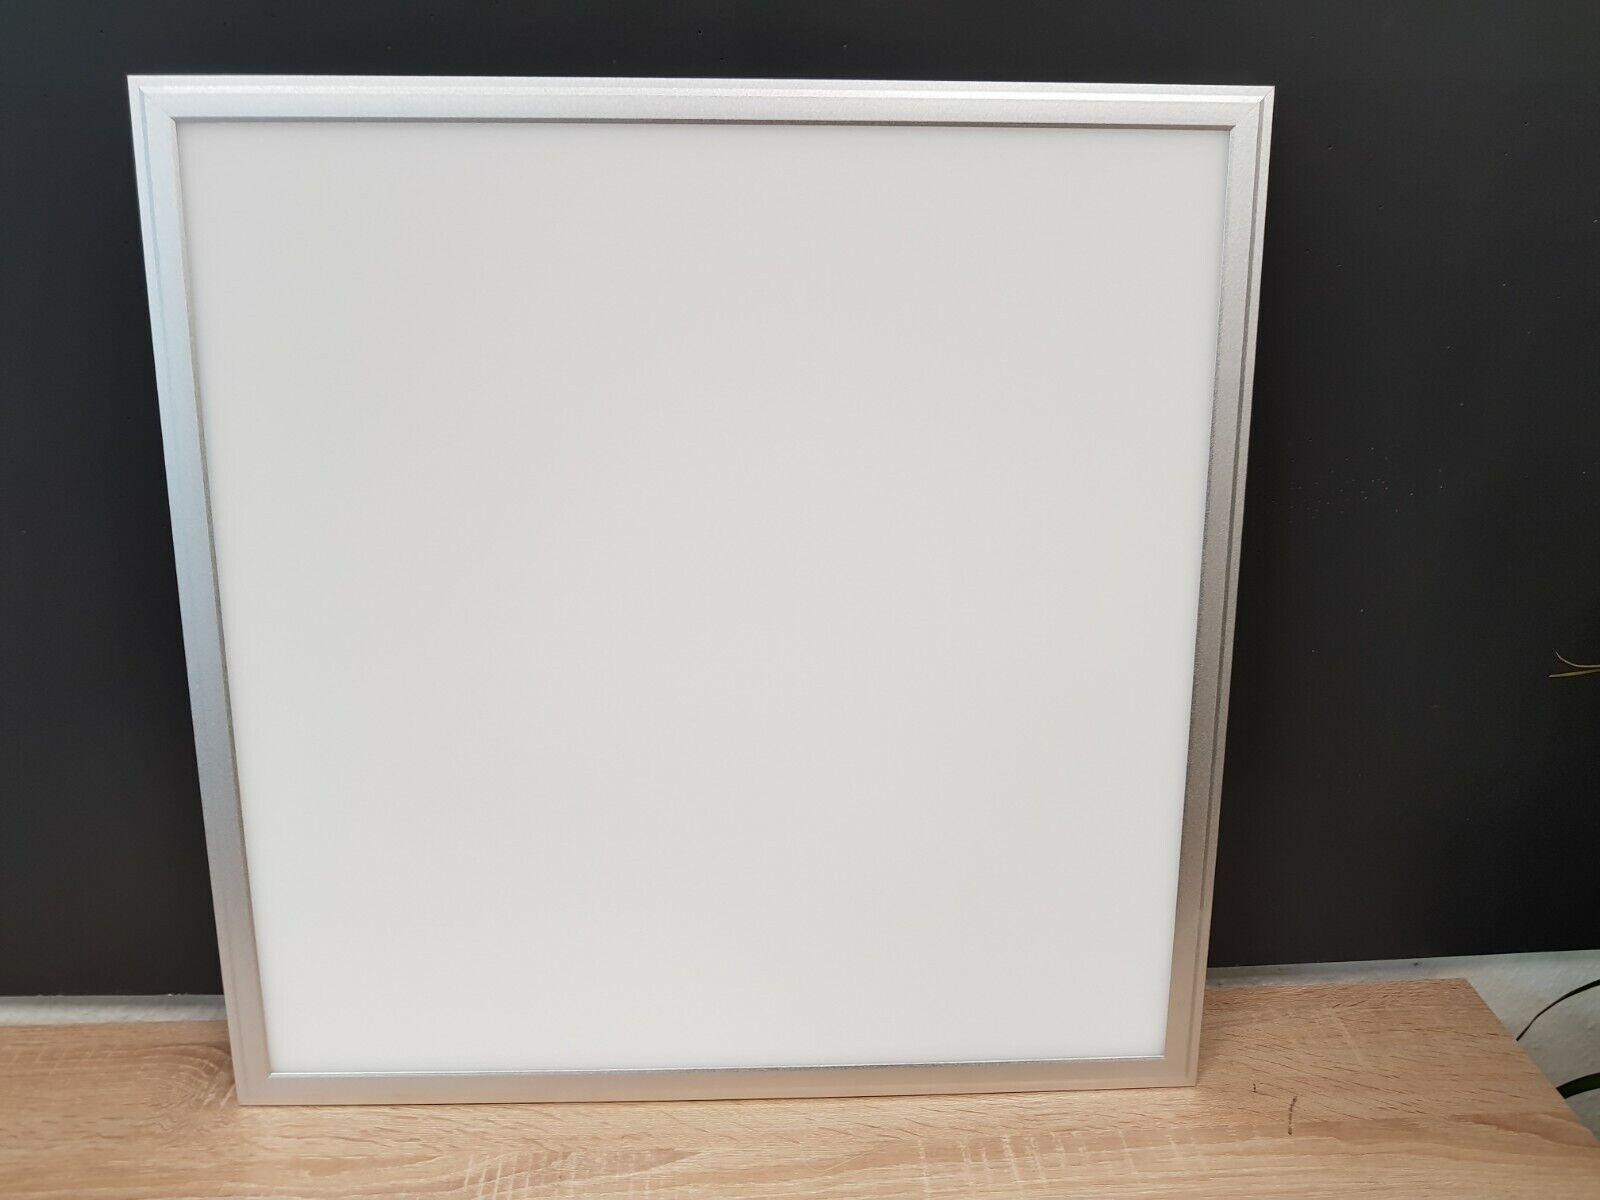 5x RVLT • DIM LED Panel 595x595mm• inkl. Netzteil MW LPF-40D-42 • 5000K • 40W